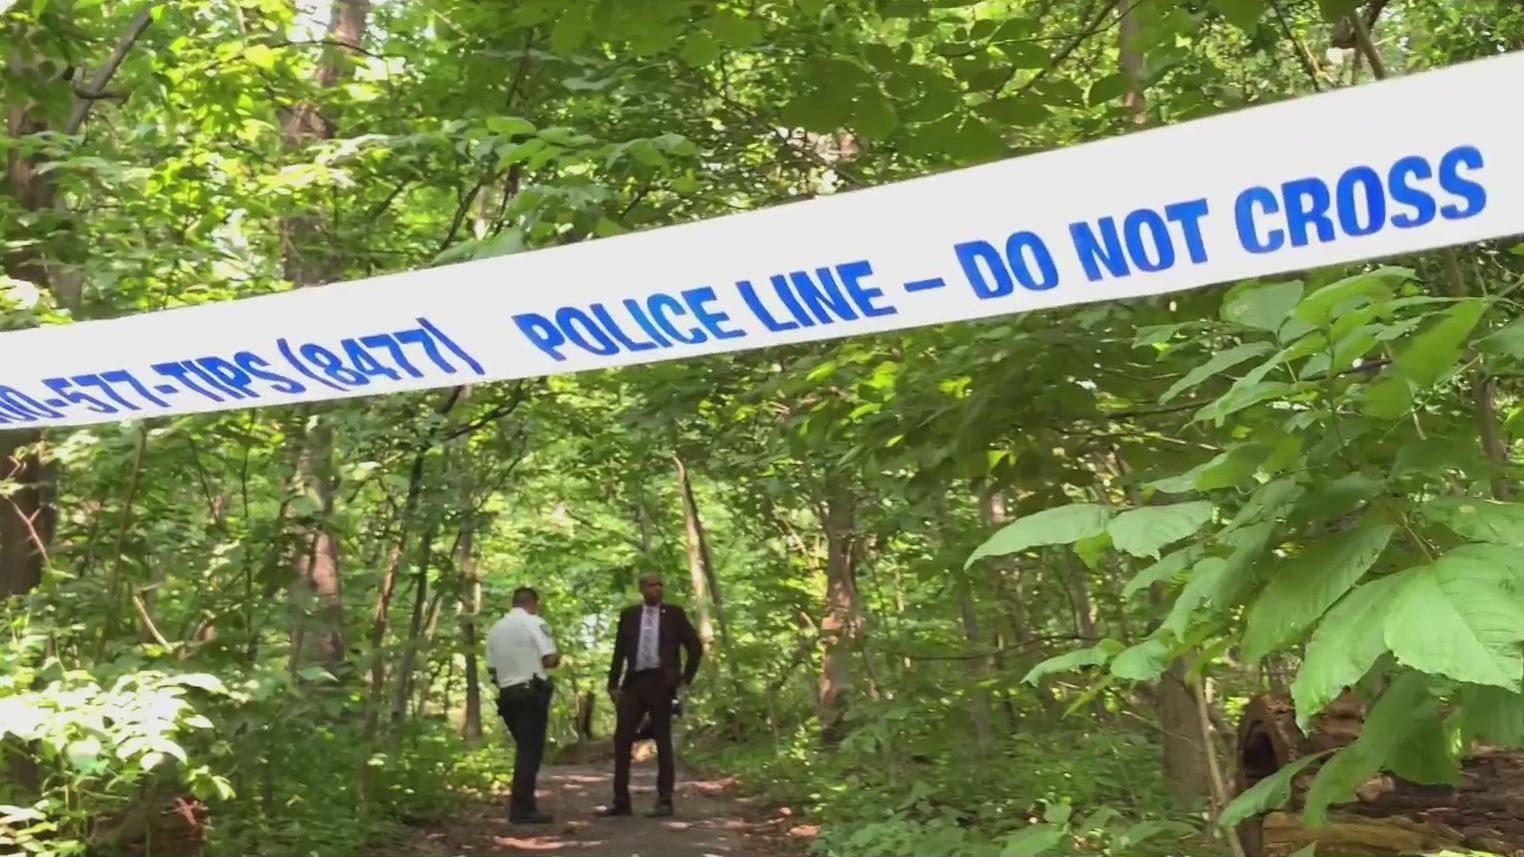 3 Women Targeted In Disturbing Crimes In Inwood Park